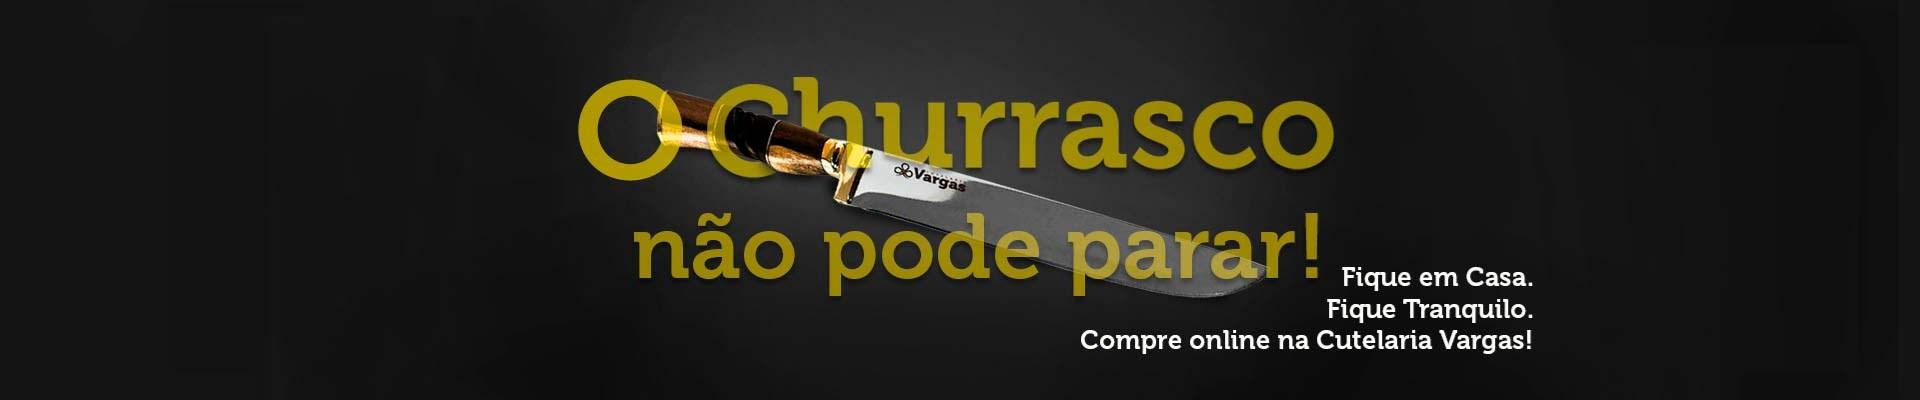 Banner Churrasco